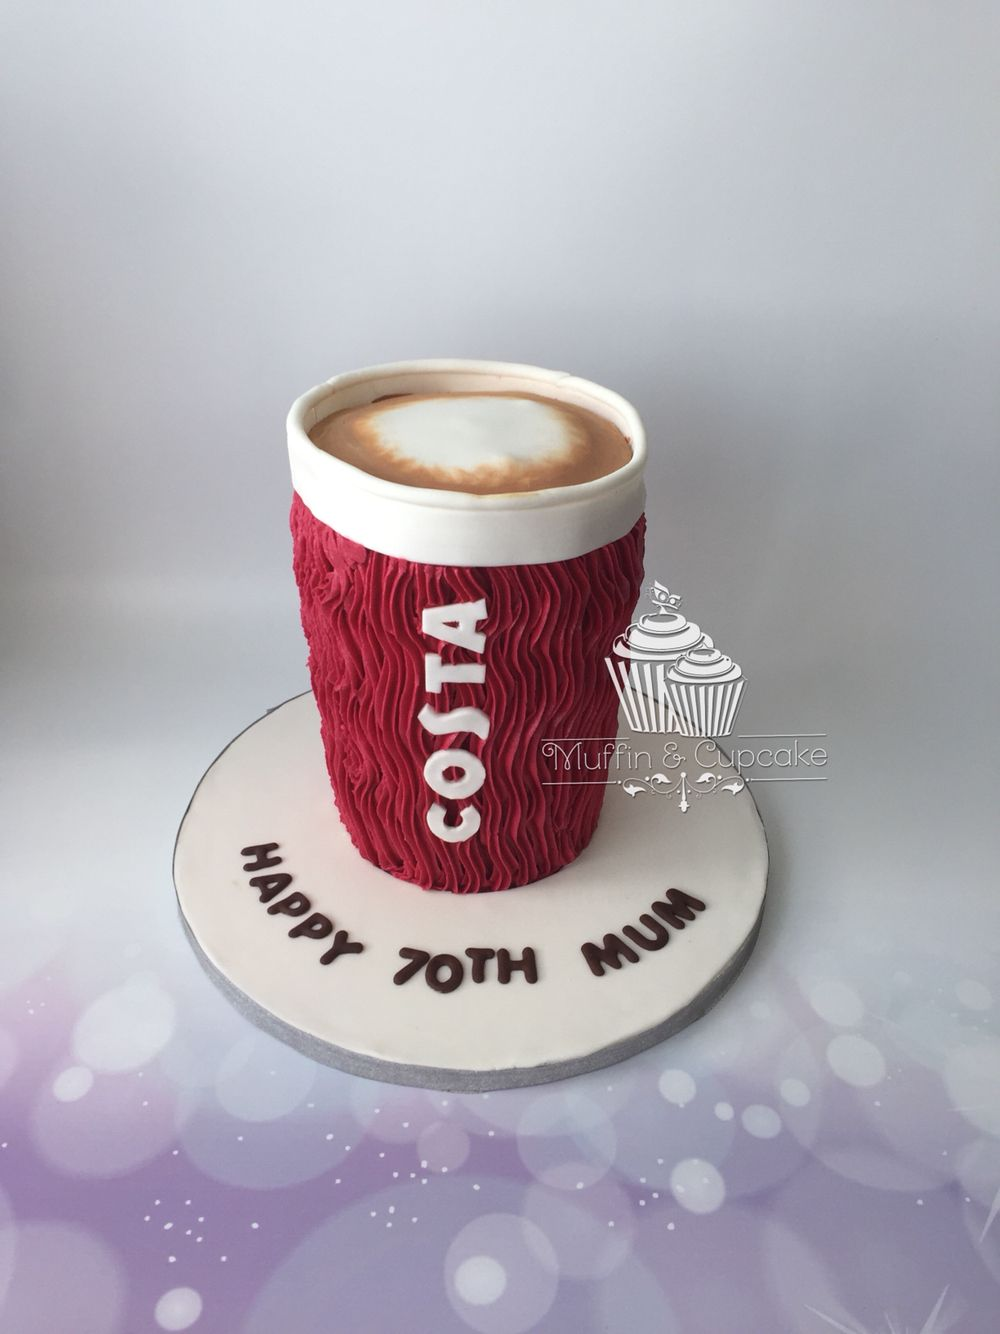 Costa Coffee Cup Cake Birthday Cakes Ideas